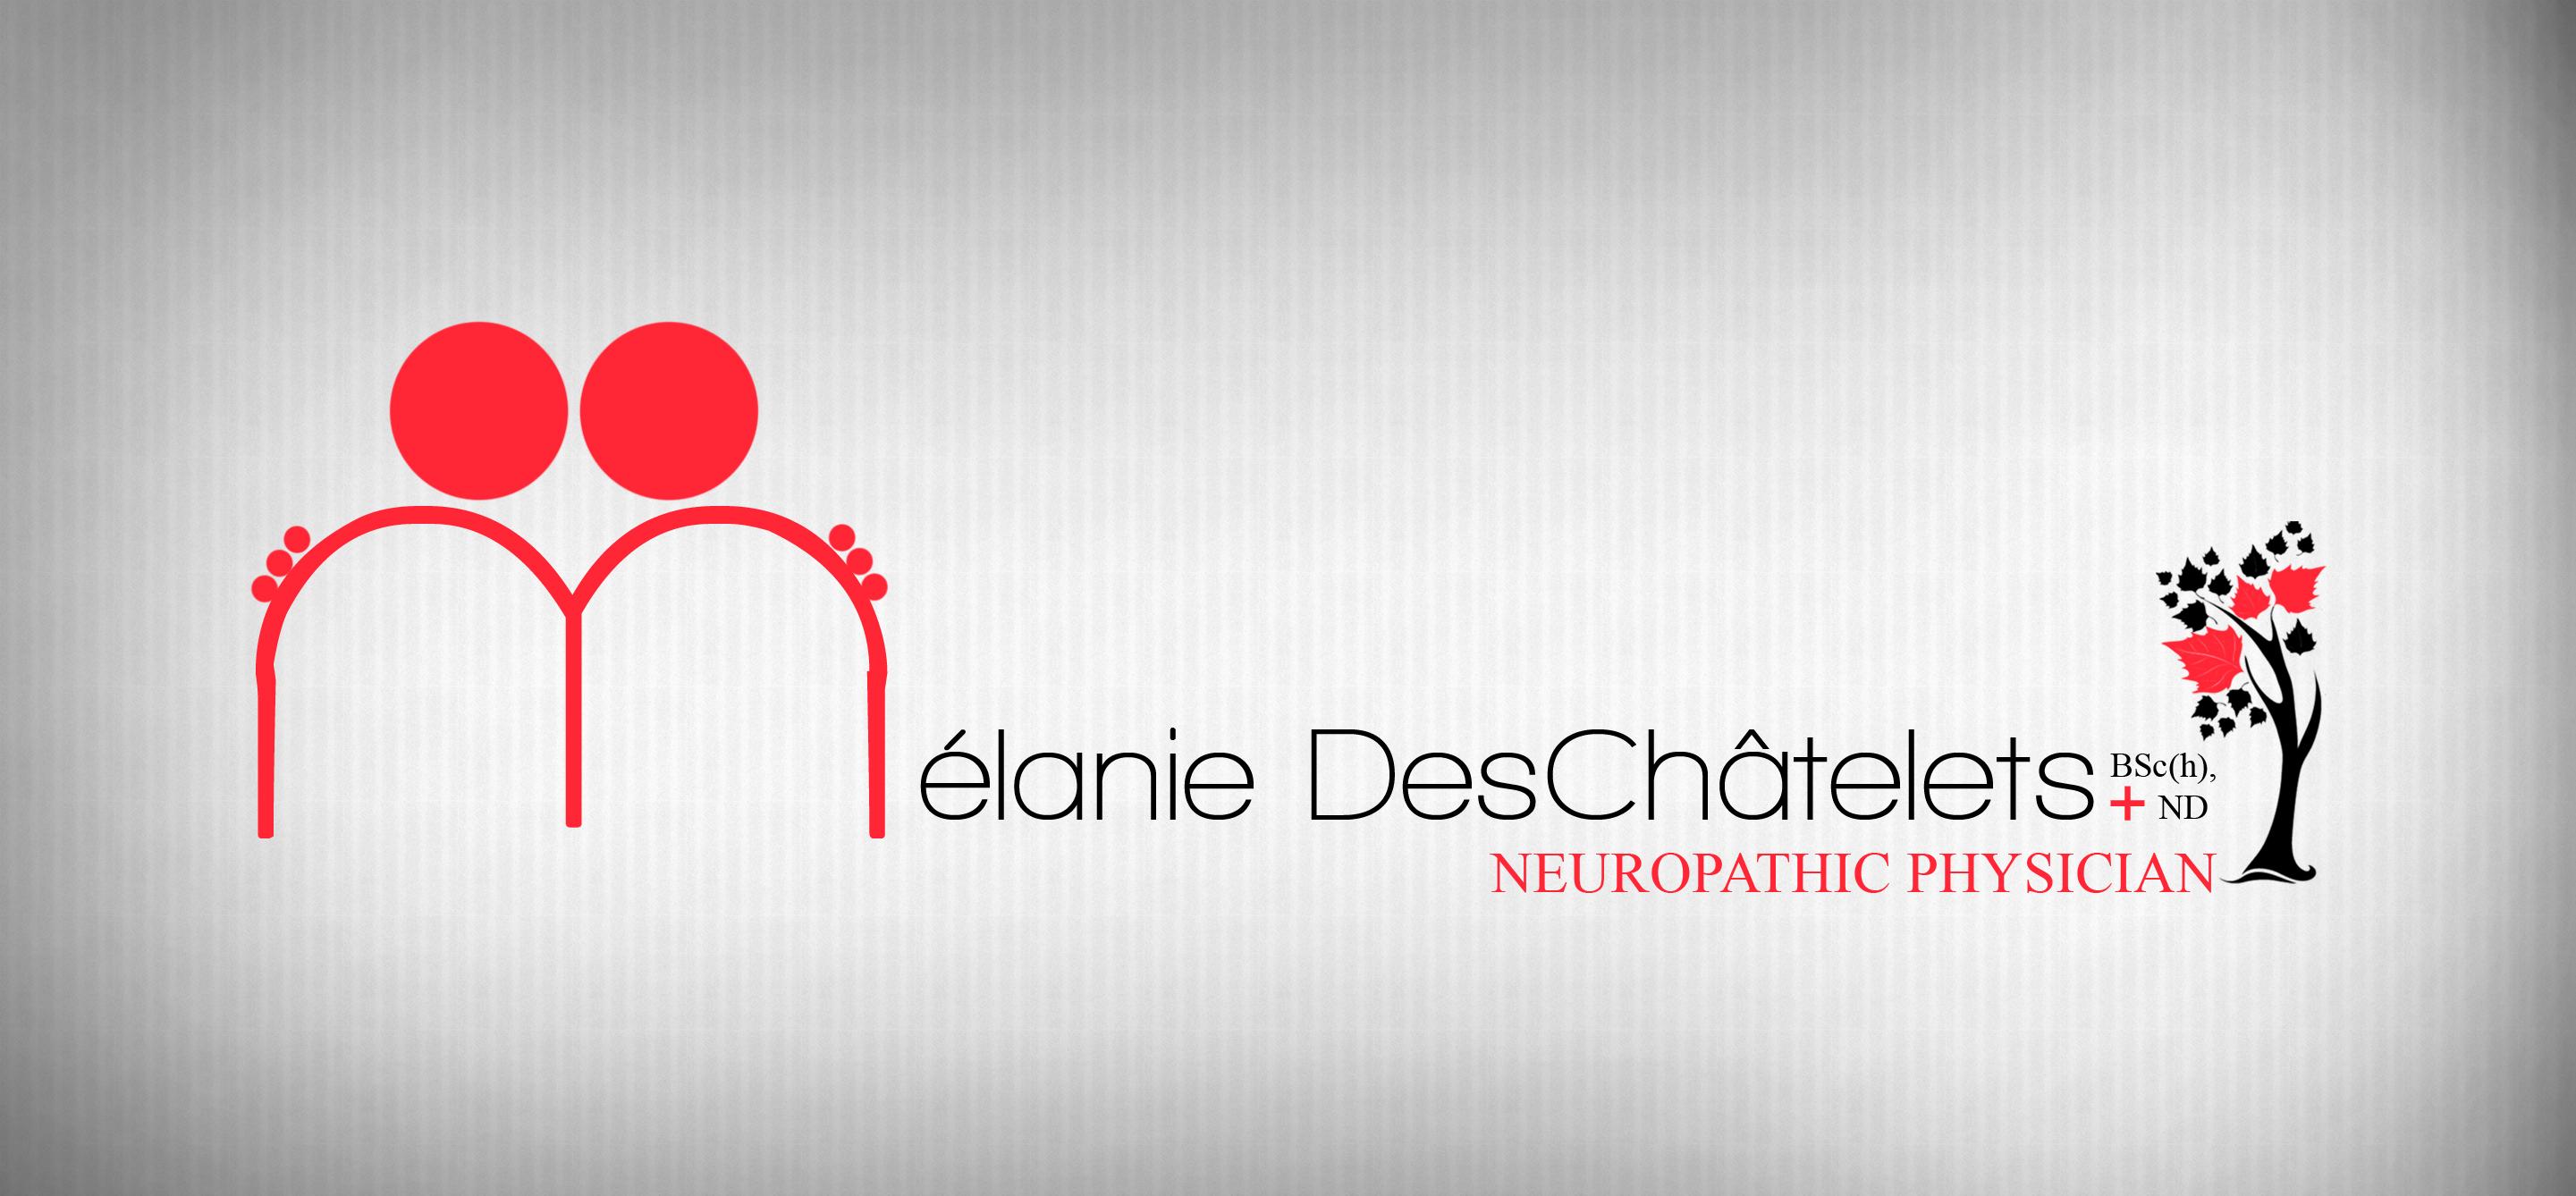 Logo Design by Sandip Kumar - Entry No. 221 in the Logo Design Contest Artistic Logo Design for Dr Mélanie DesChâtelets.